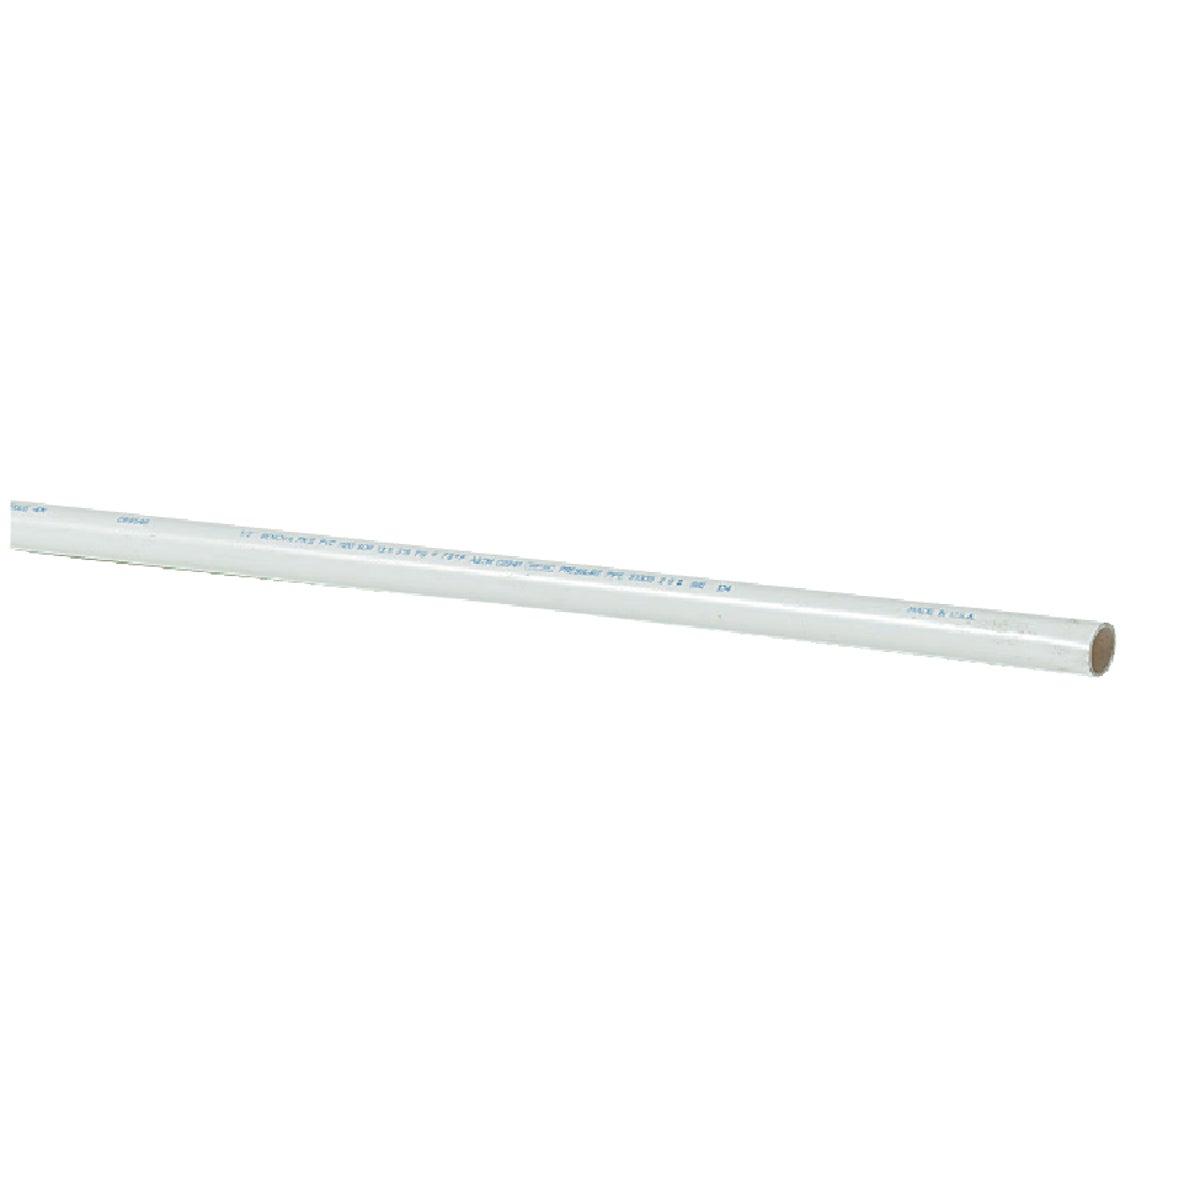 "1/2""X10' SDR13 PVC PIPE"